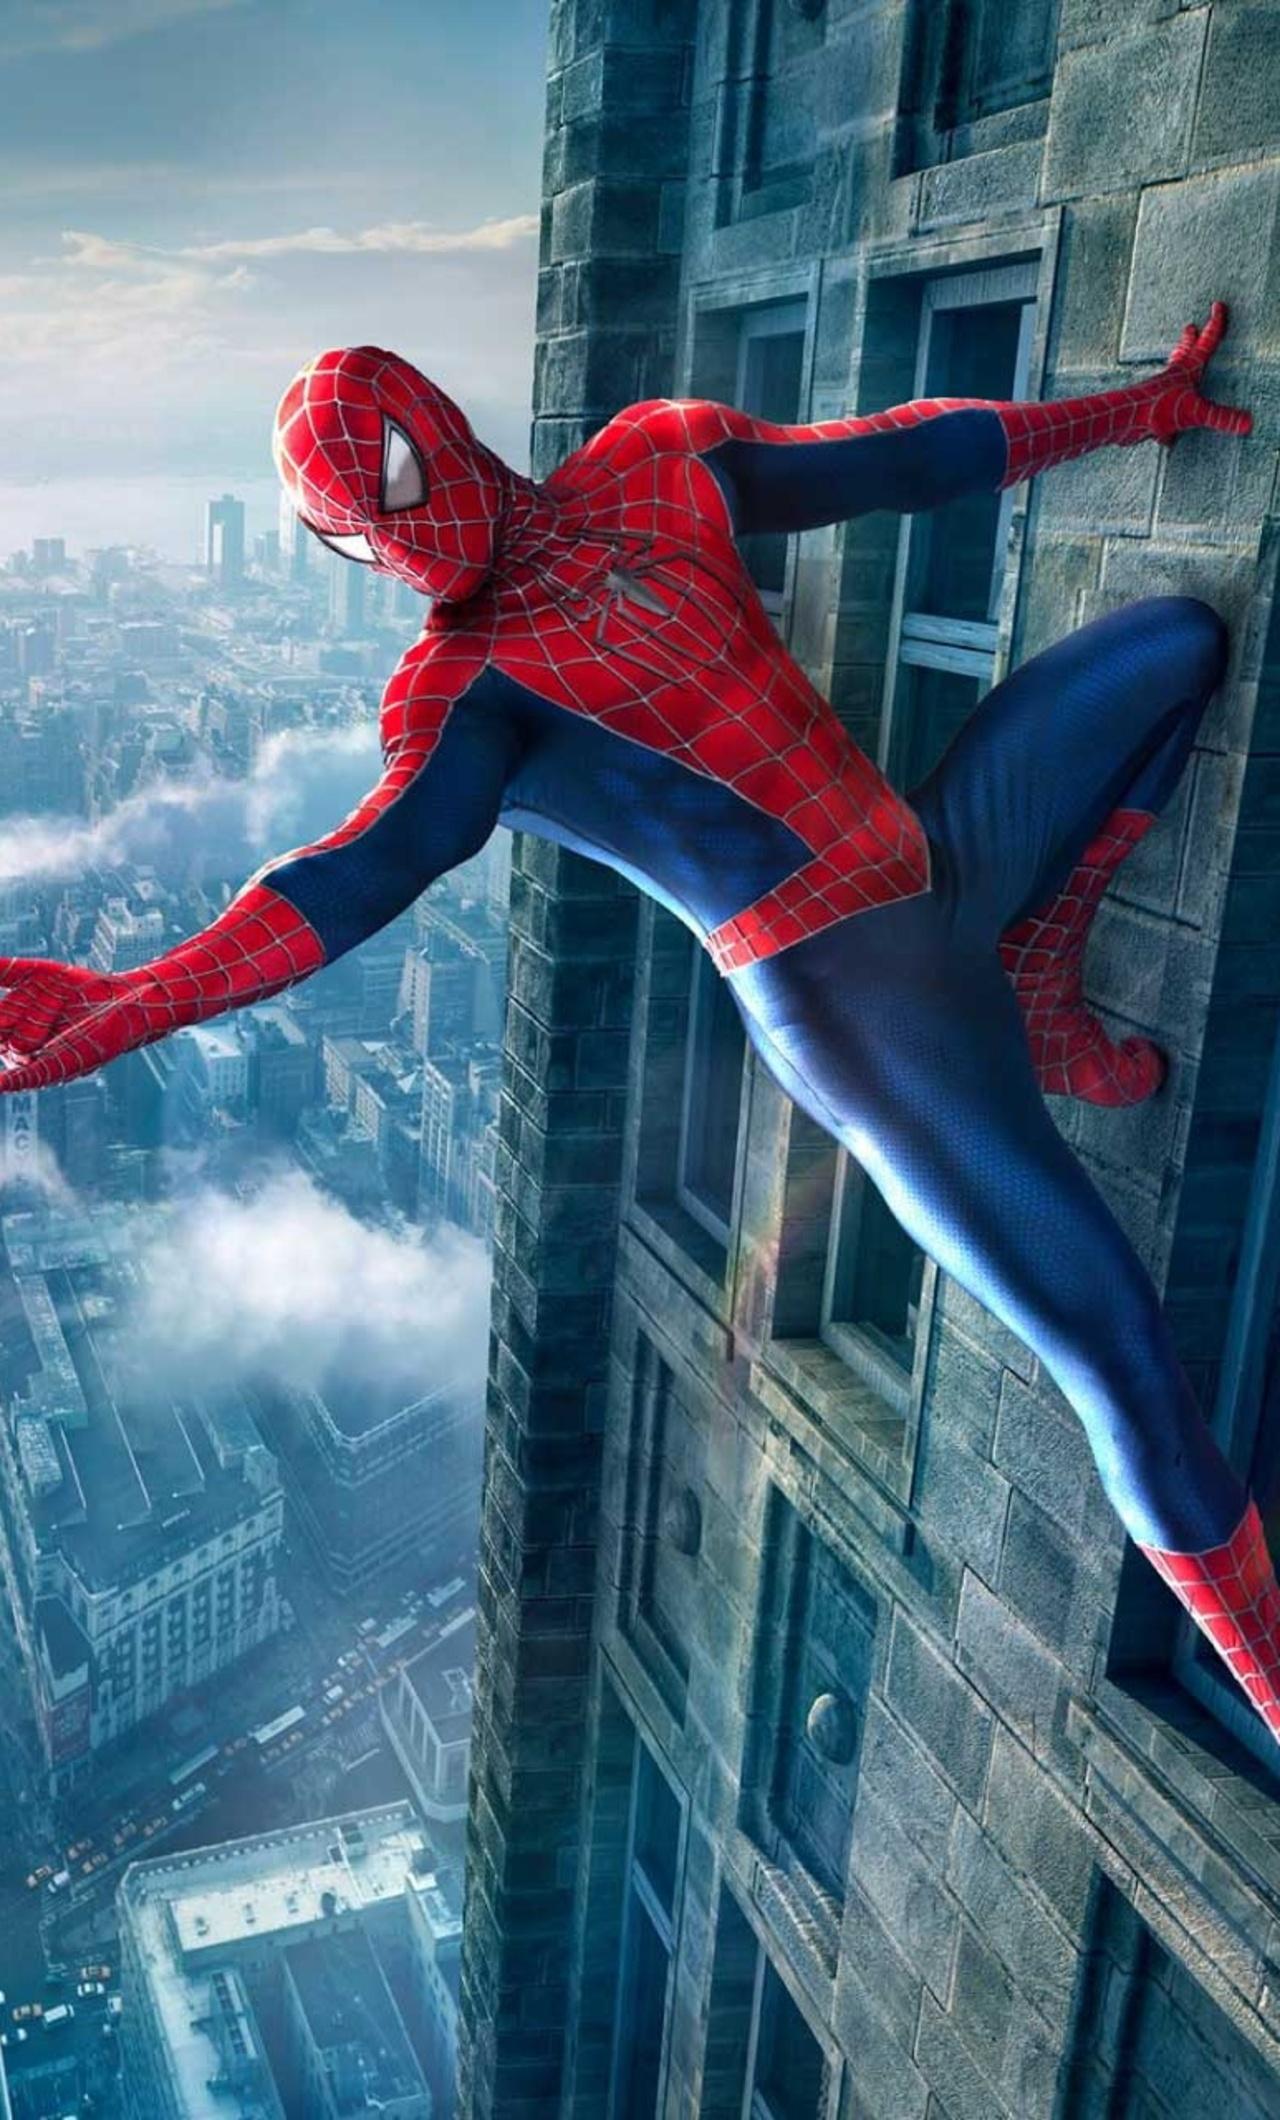 spiderman-new-york-u2.jpg